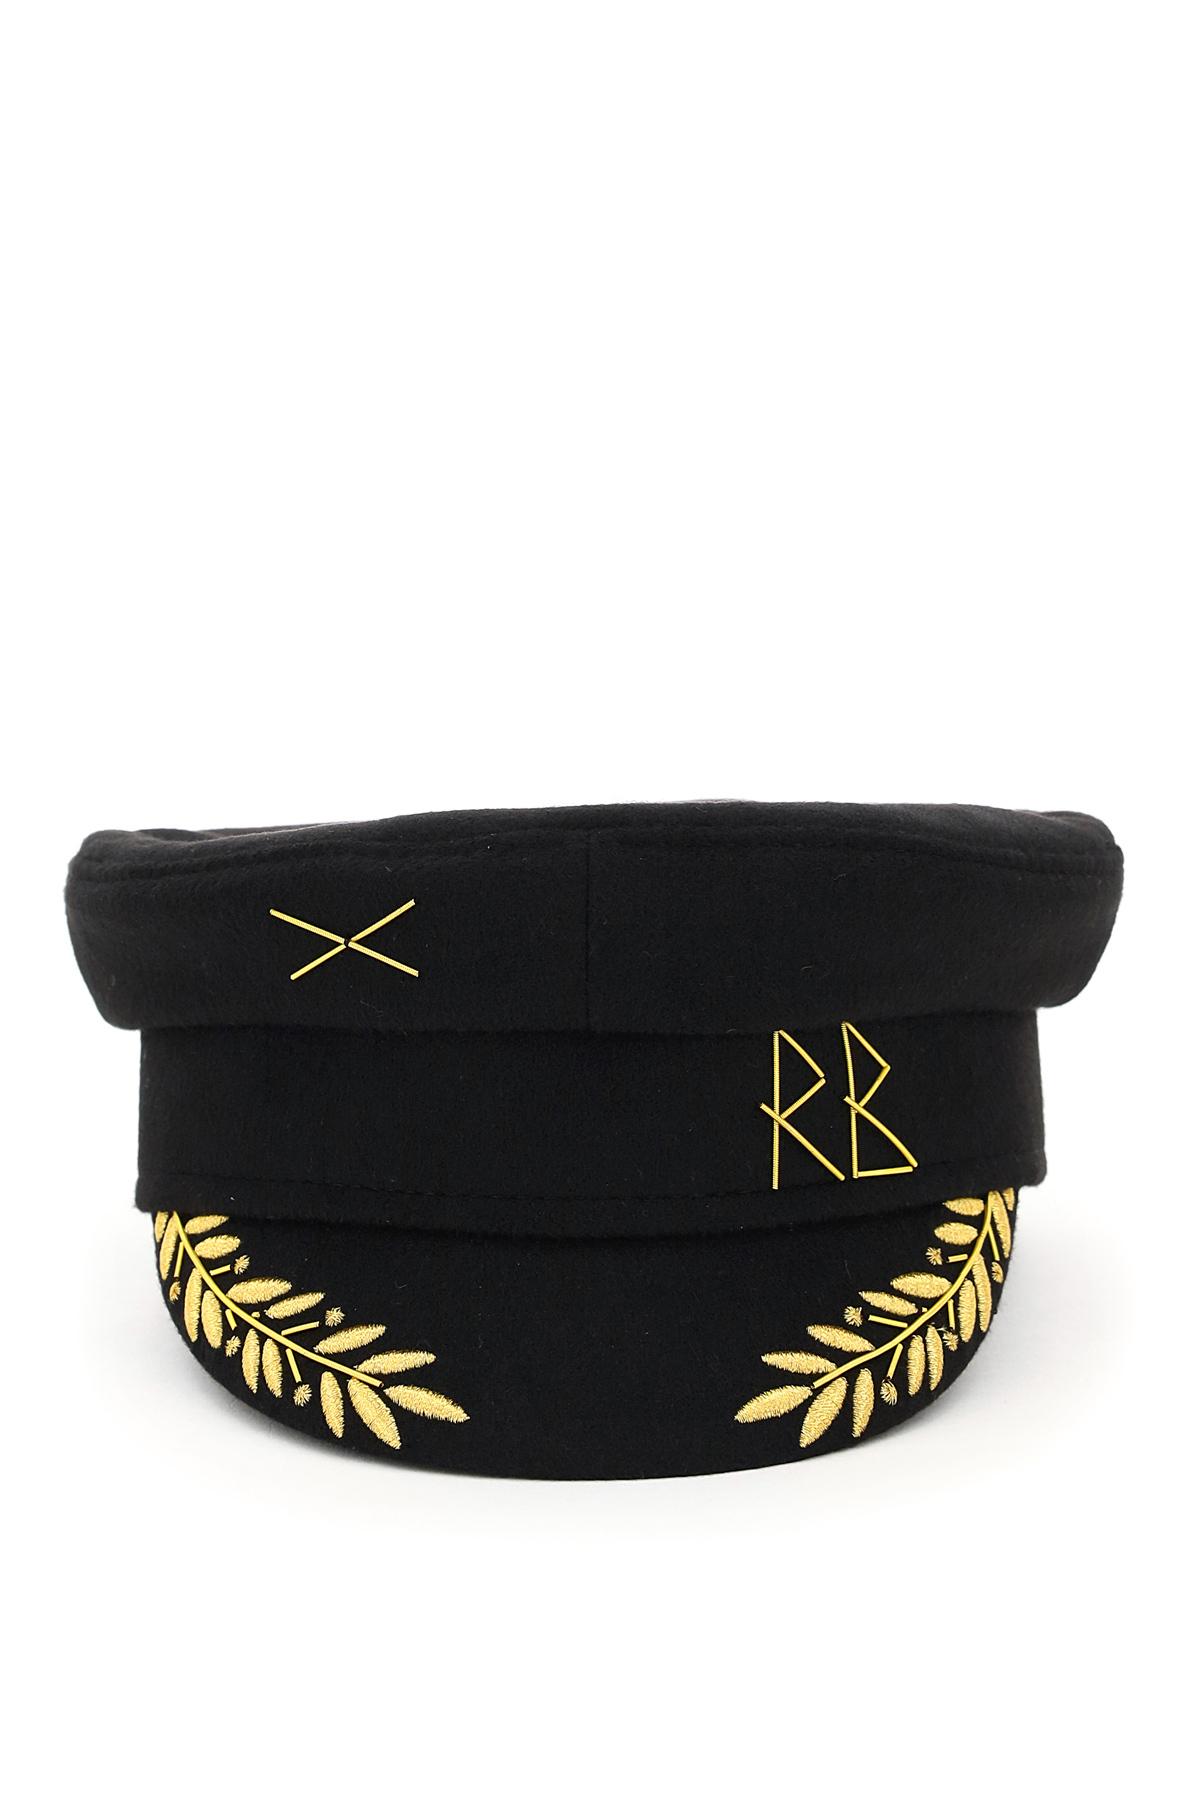 Ruslan baginskiy cappello baker boy rb warcore